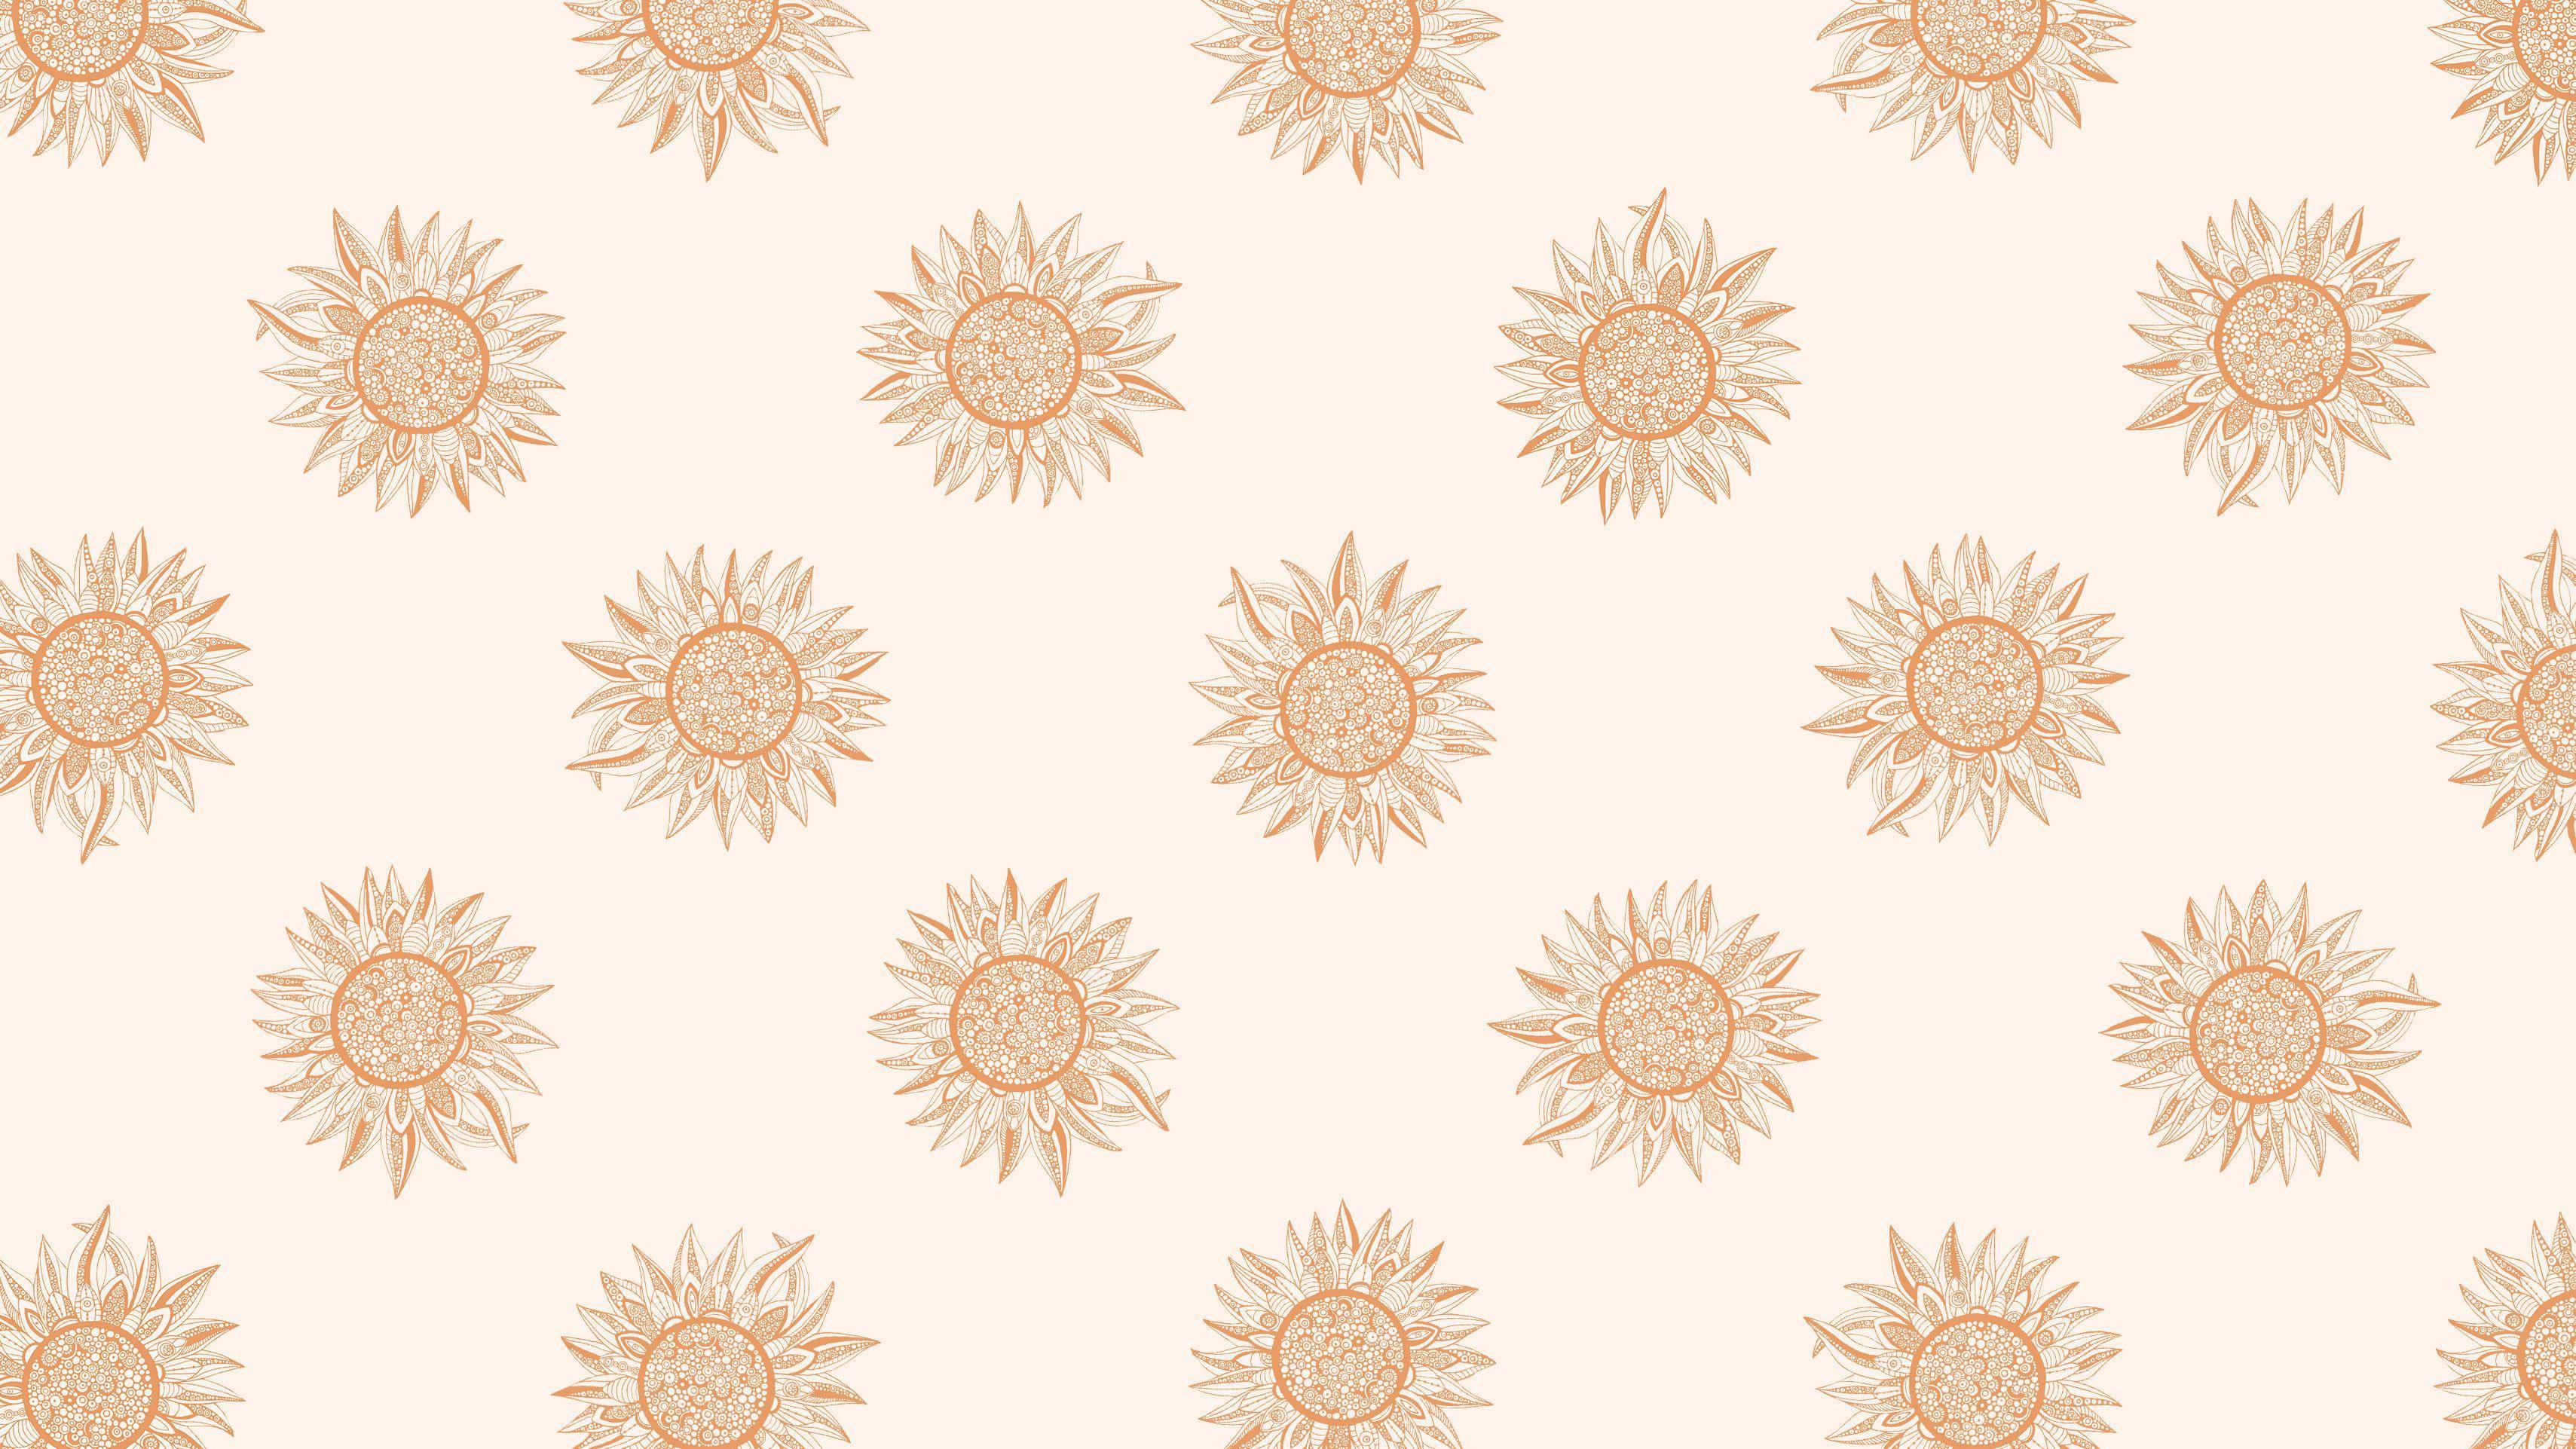 Rose Gold Desktop Wallpapers Top Free Rose Gold Desktop